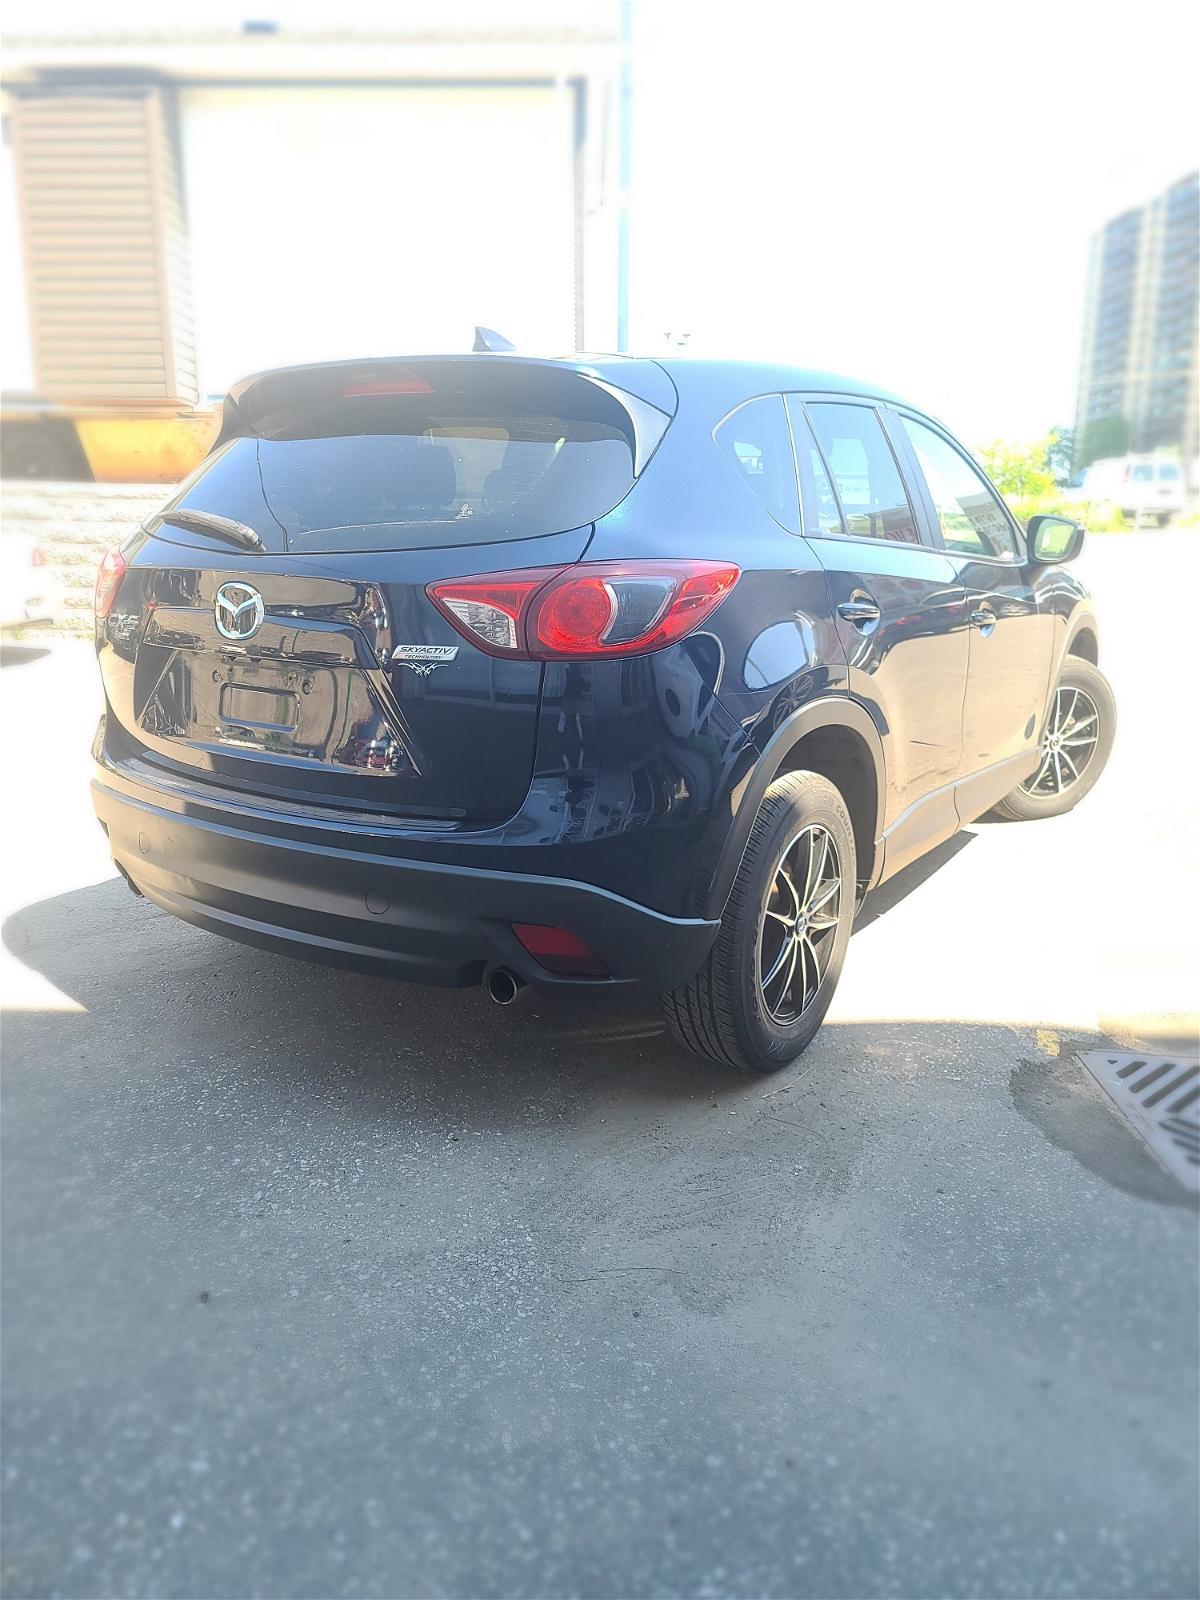 2016 - Mazda - CX-5 - JM3KE2CY8G0622273